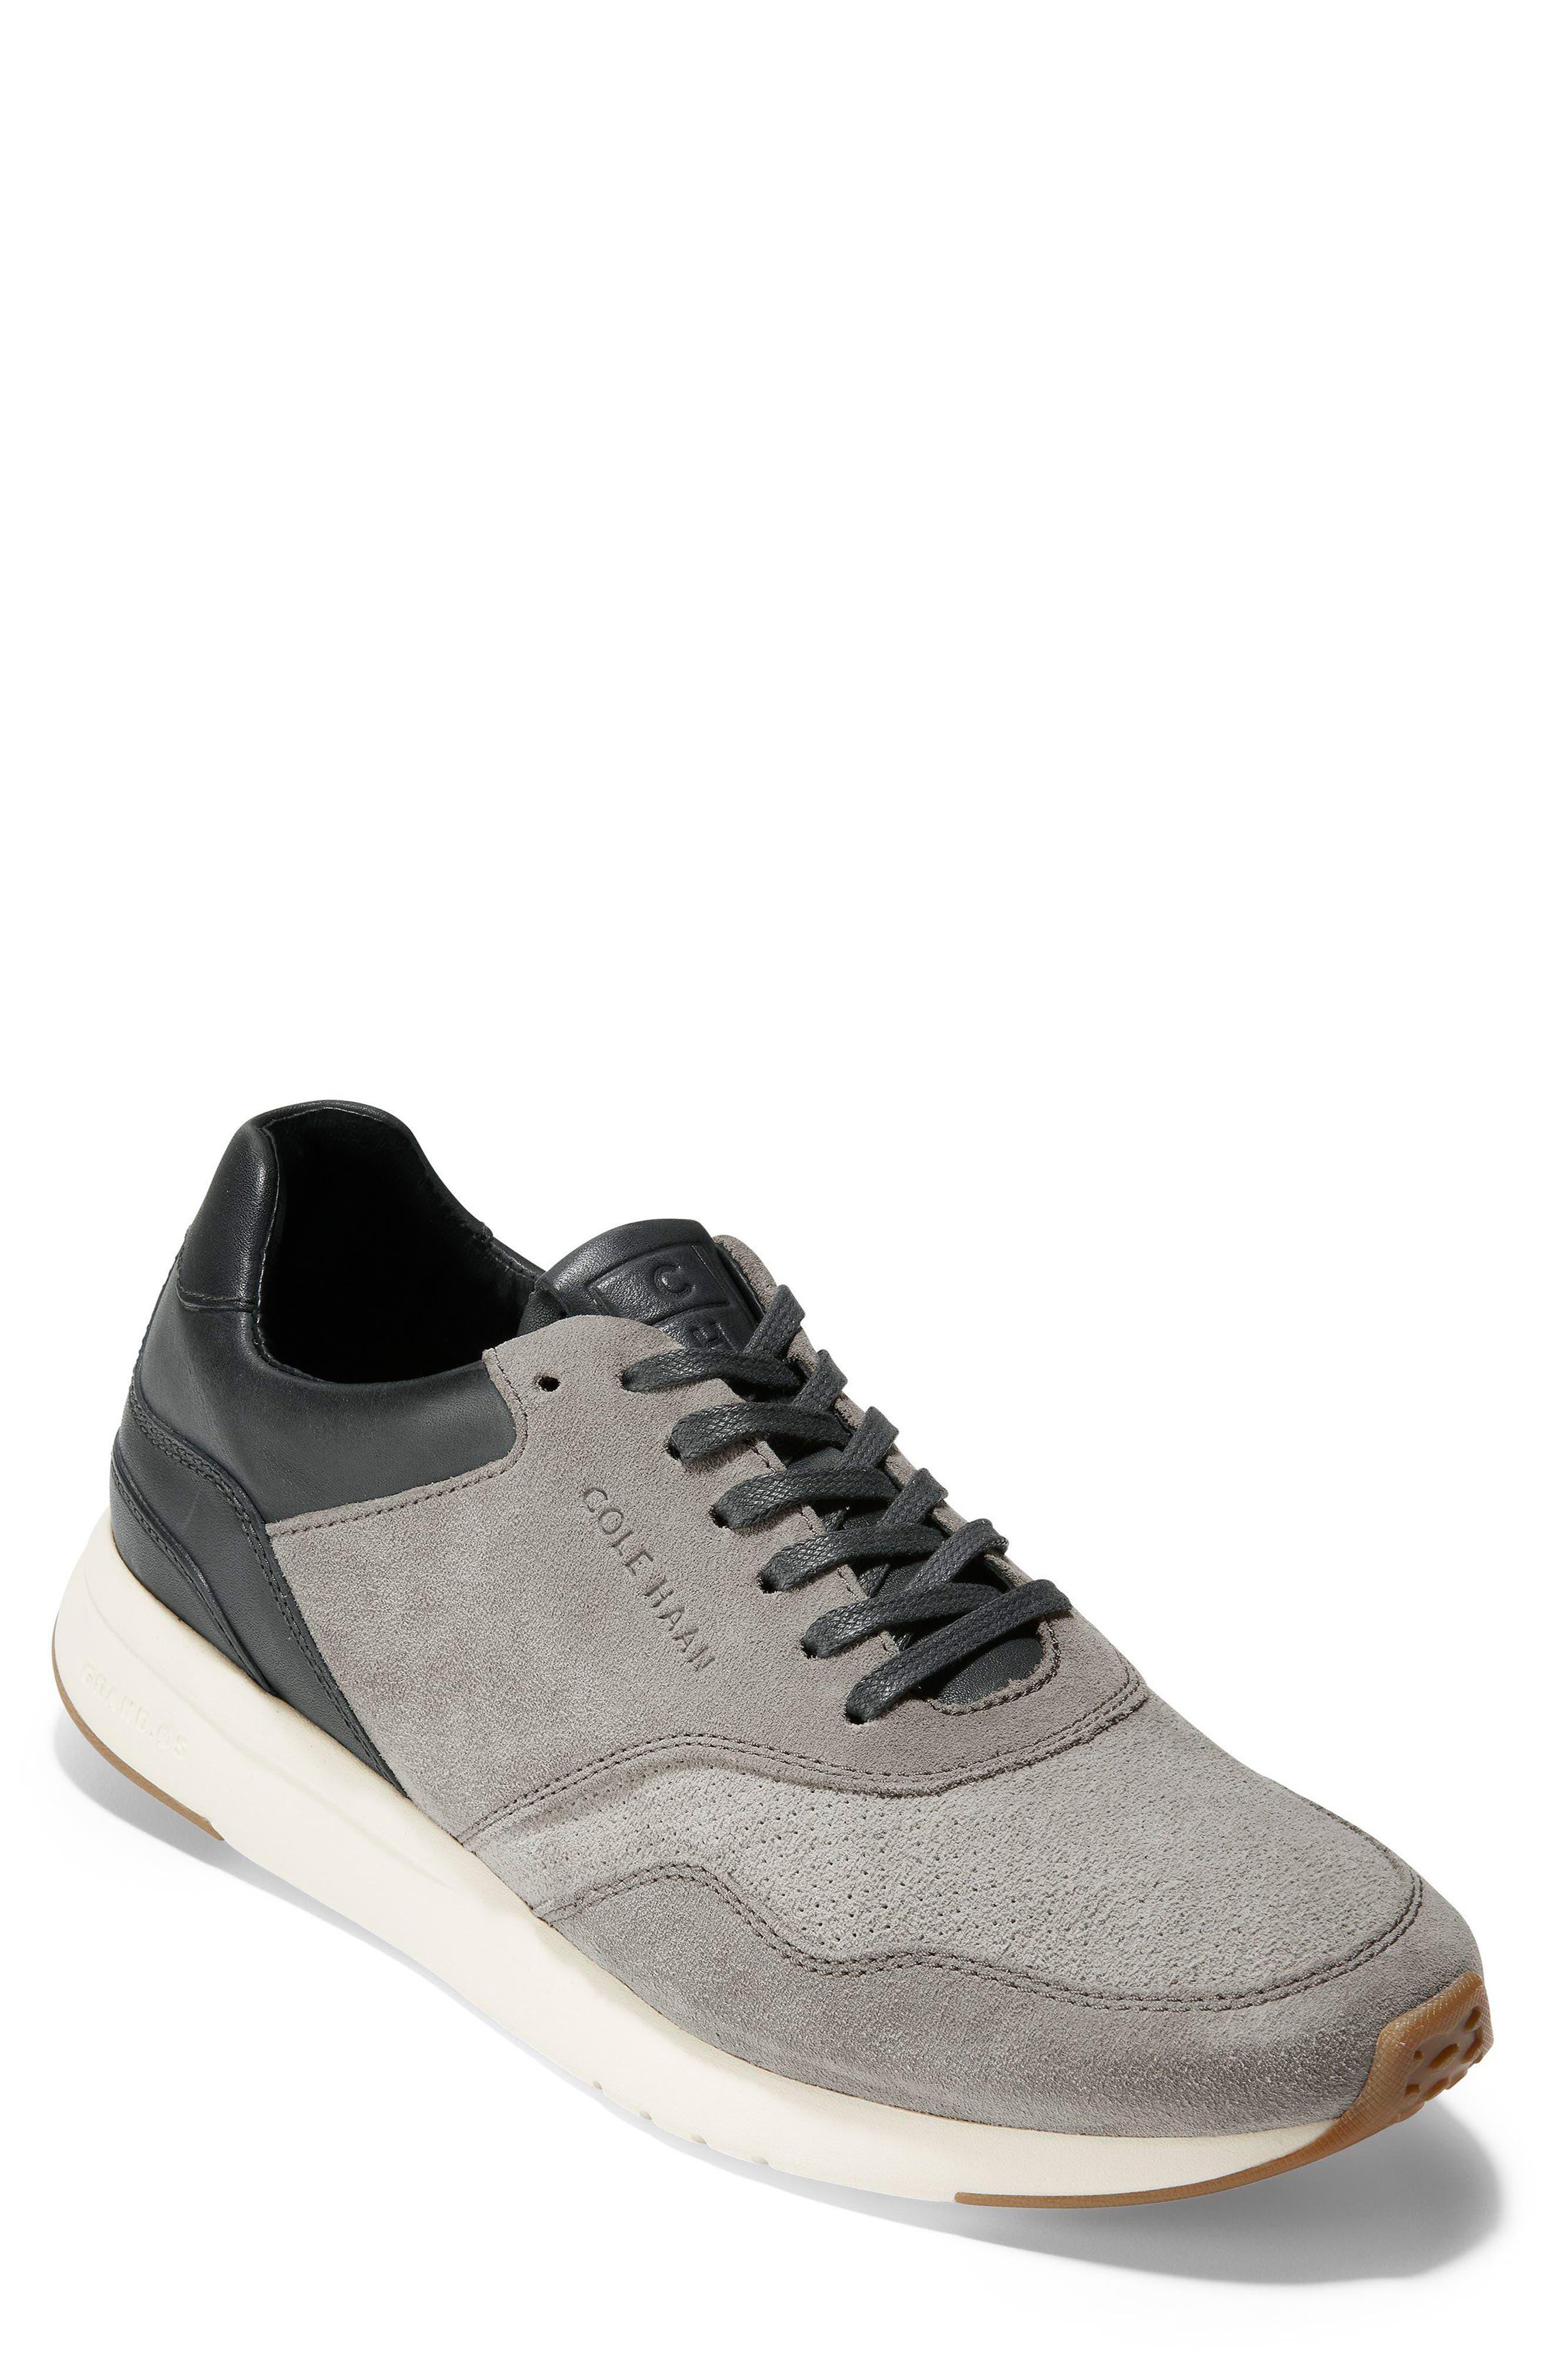 GrandPro Runner Sneaker,                         Main,                         color, 020